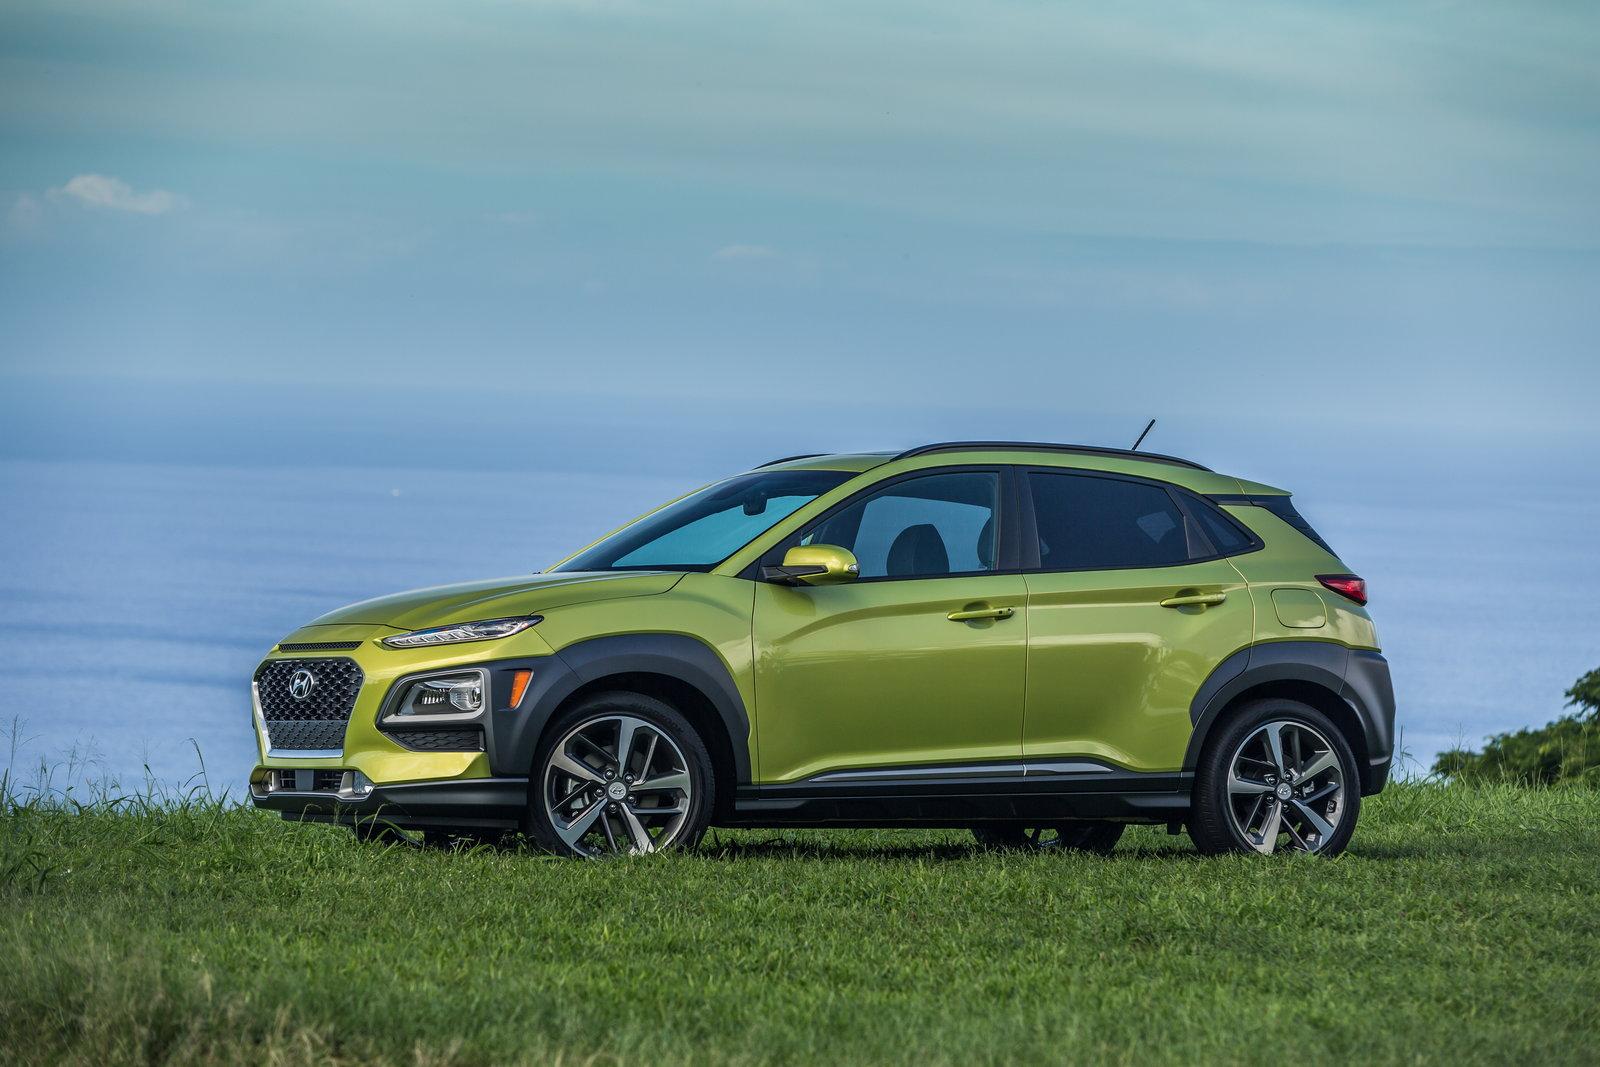 2018 Hyundai Kona Fuel Economy Rated At Up To 30 MPG ...